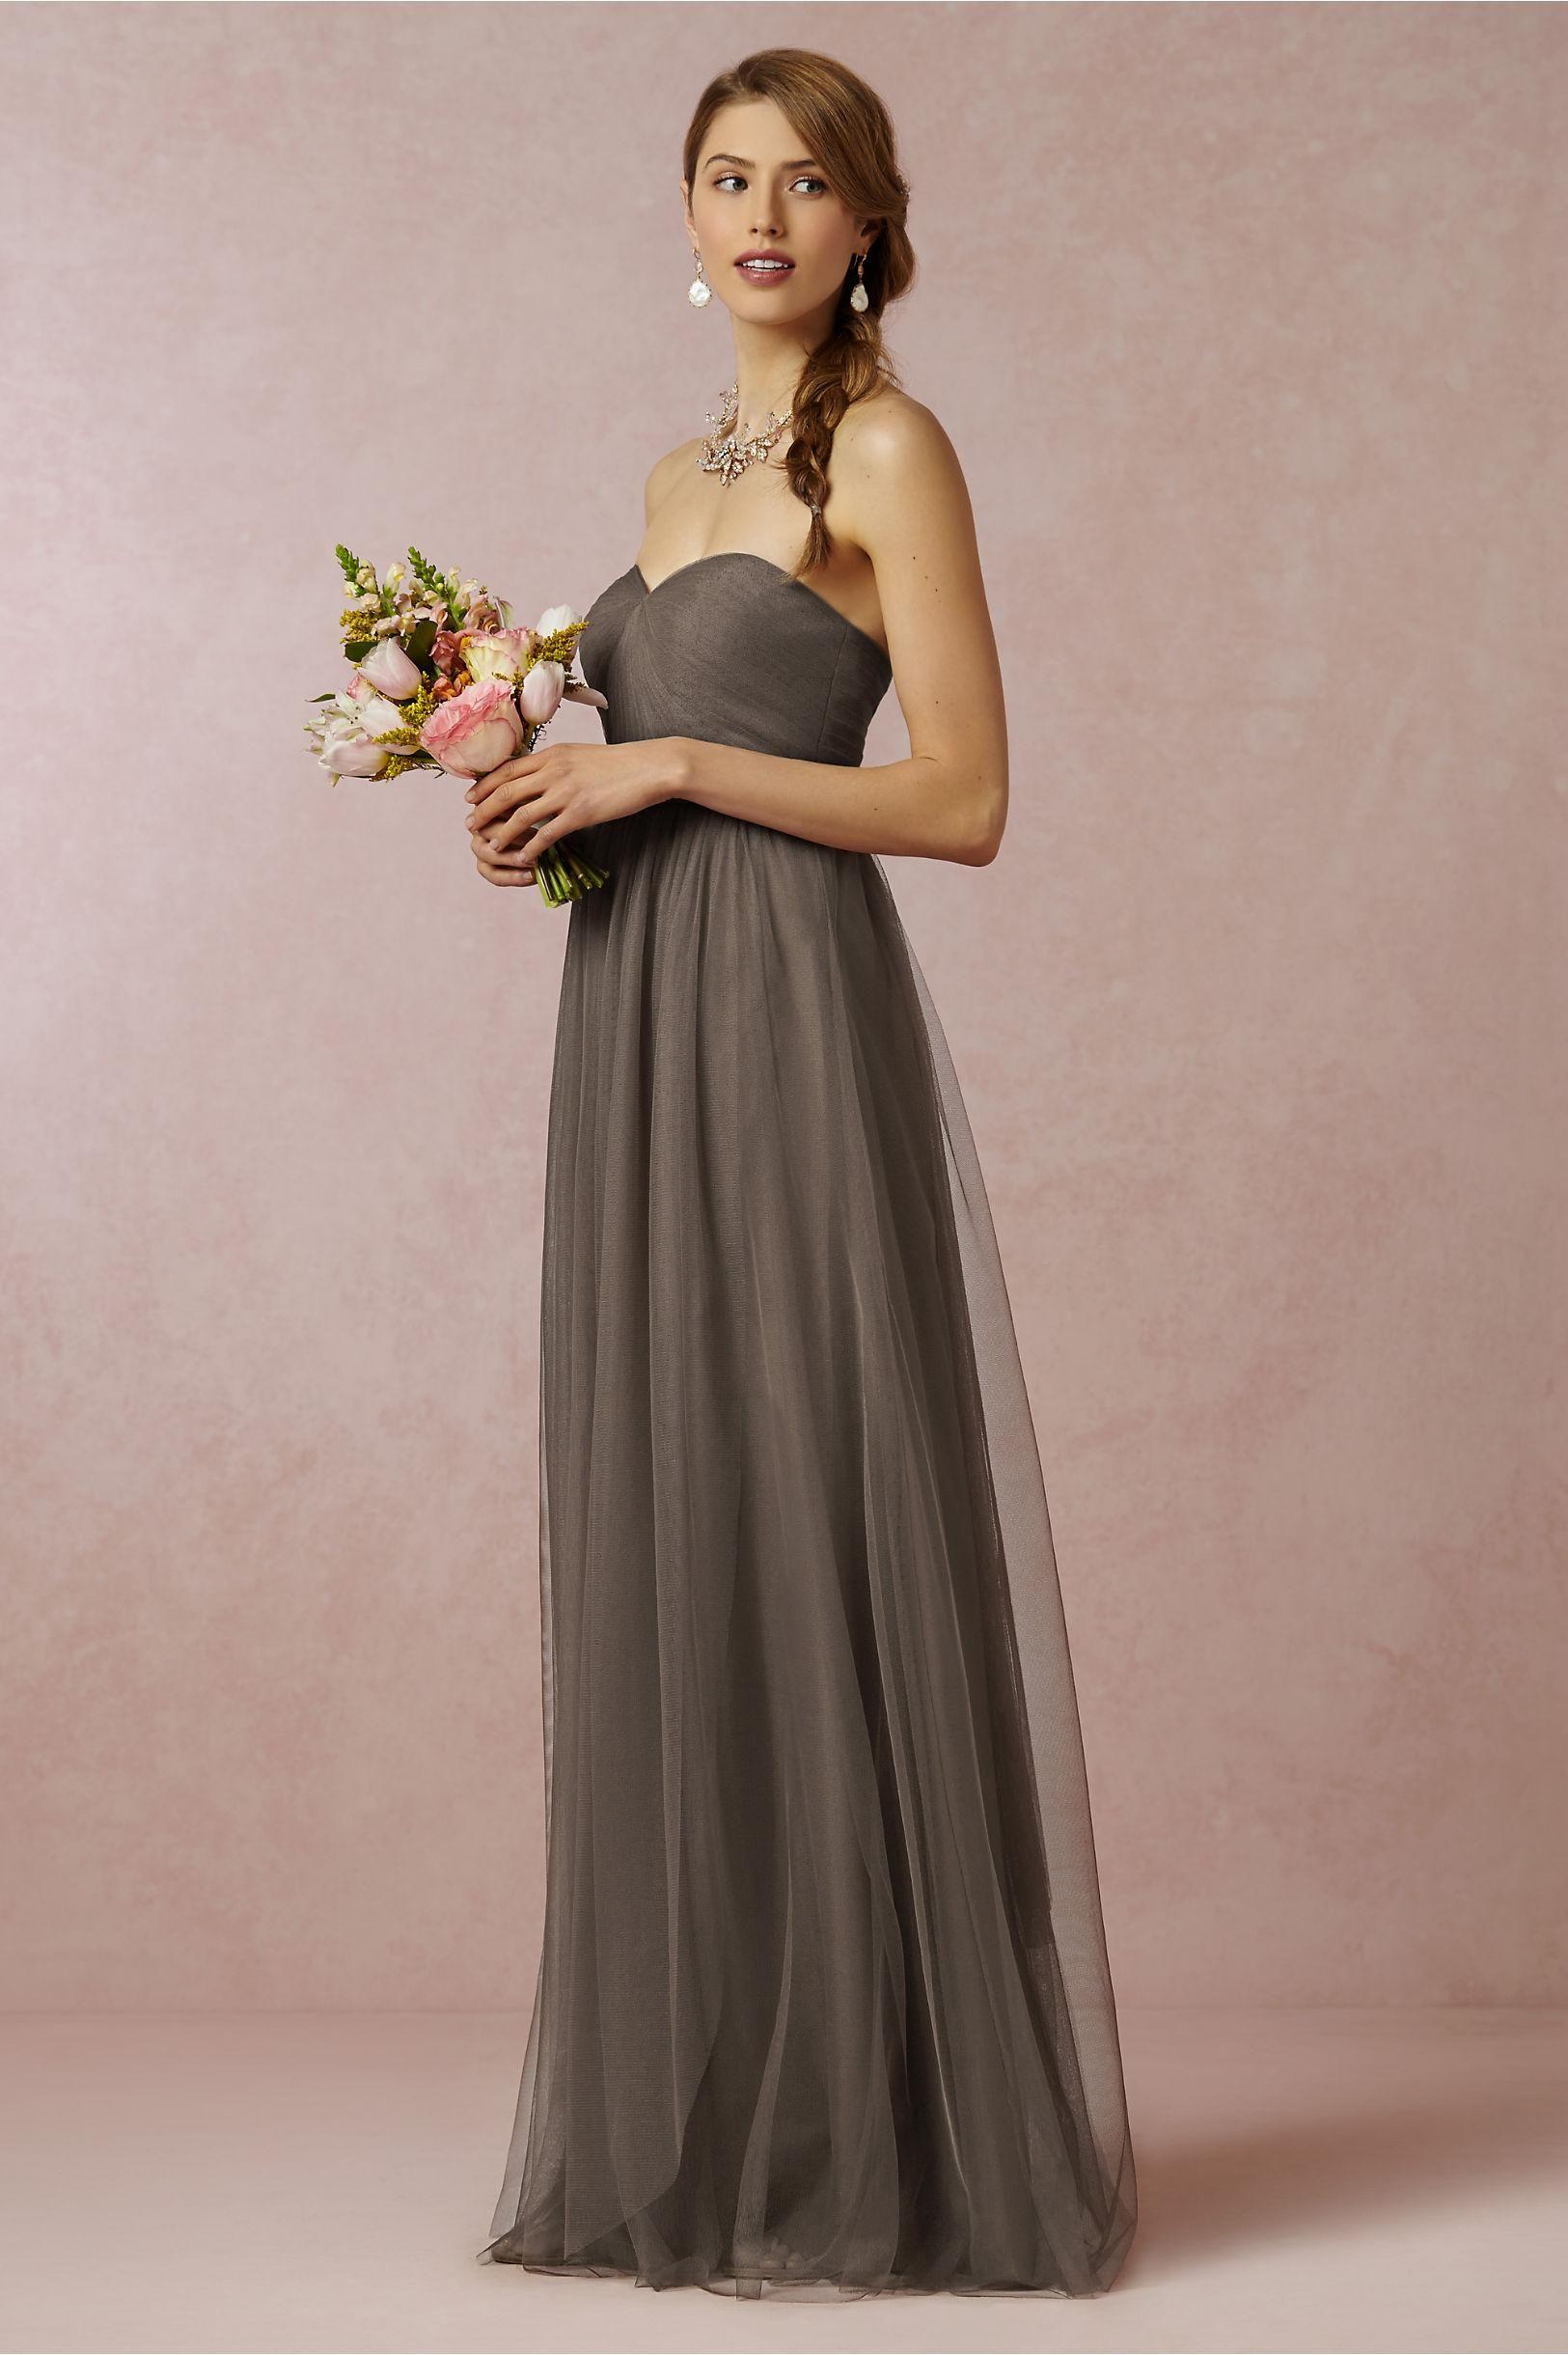 ace12415e6 Zipper A-line Floor-length Bridesmaid Dresses. Annabelle Bridesmaids Dress  from Jenny Yoo for BHLDN in warm mocha